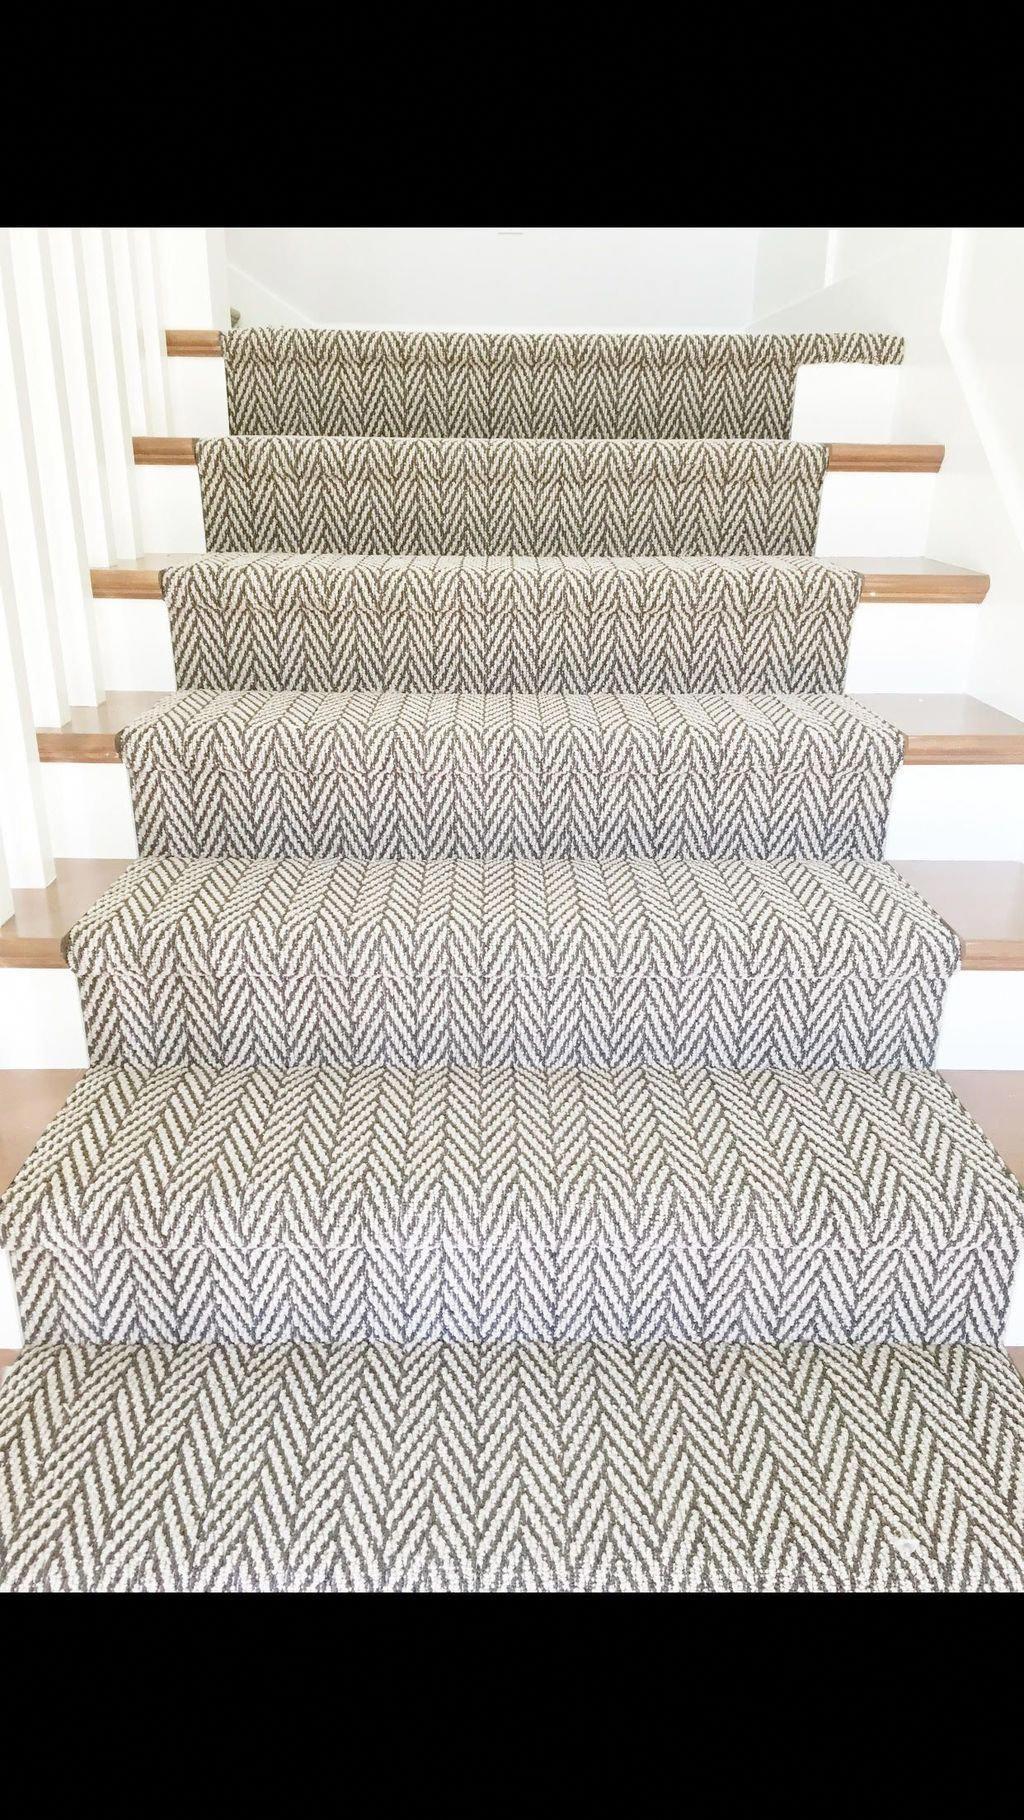 Cheap Carpet Runners By The Foot Pinkcarpetrunnerrental Refferal 5666042082 Stair Runner Carpet Farmhouse Stairs Staircase Runner